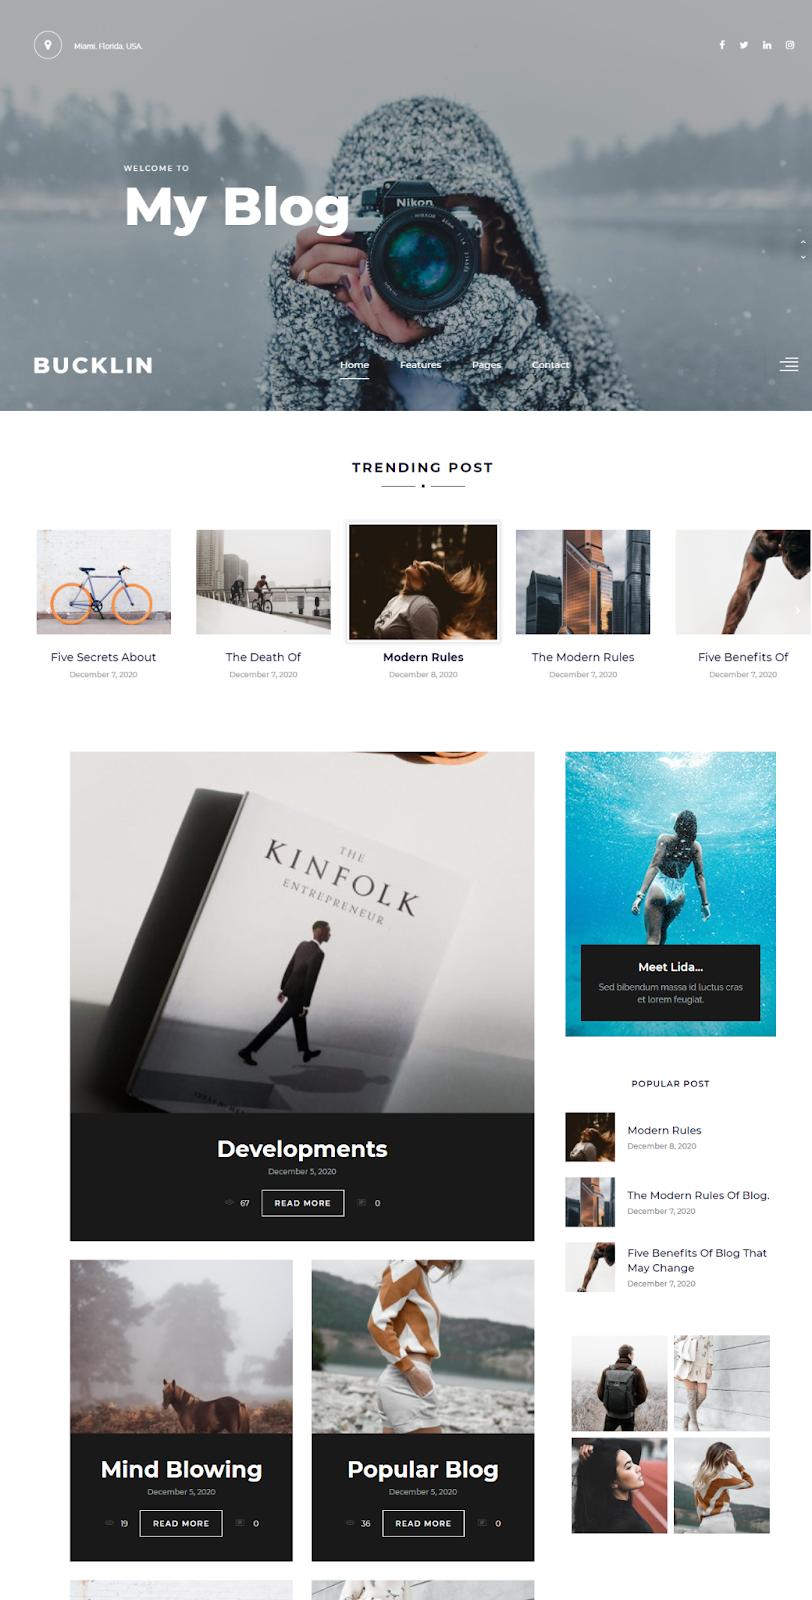 Best WordPress Instagram Theme Bucklin